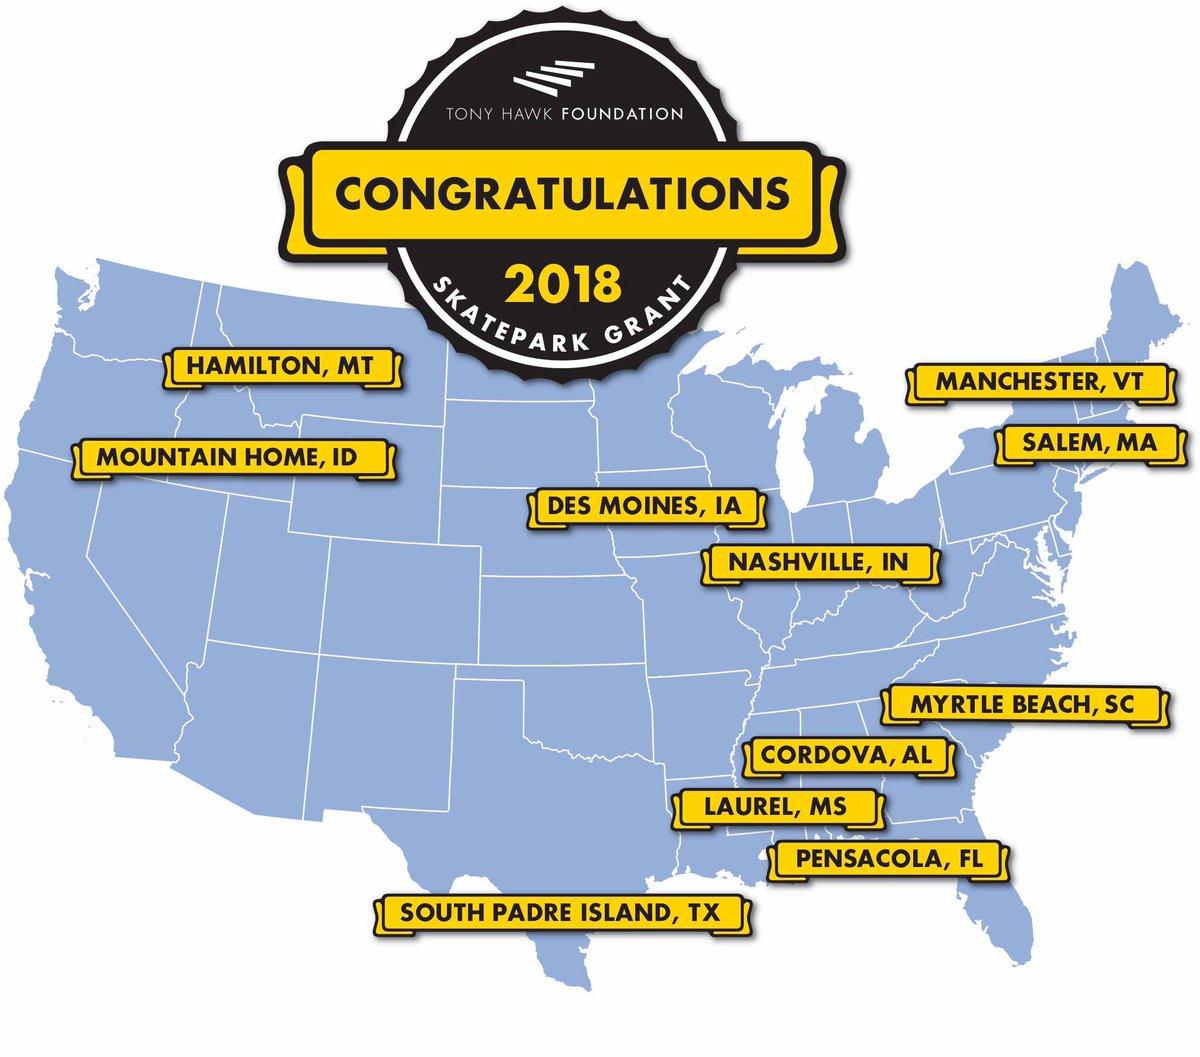 Skaters rejoice! #Laurel, MS is one of 11 Skatepark Grant recipients from the @THF . Unbelievable news for Laurel! #VisitMS  https:// bit.ly/2O5KNuU  &nbsp;   @joneschamberms  @tonyhawk<br>http://pic.twitter.com/emvsmsFTBt